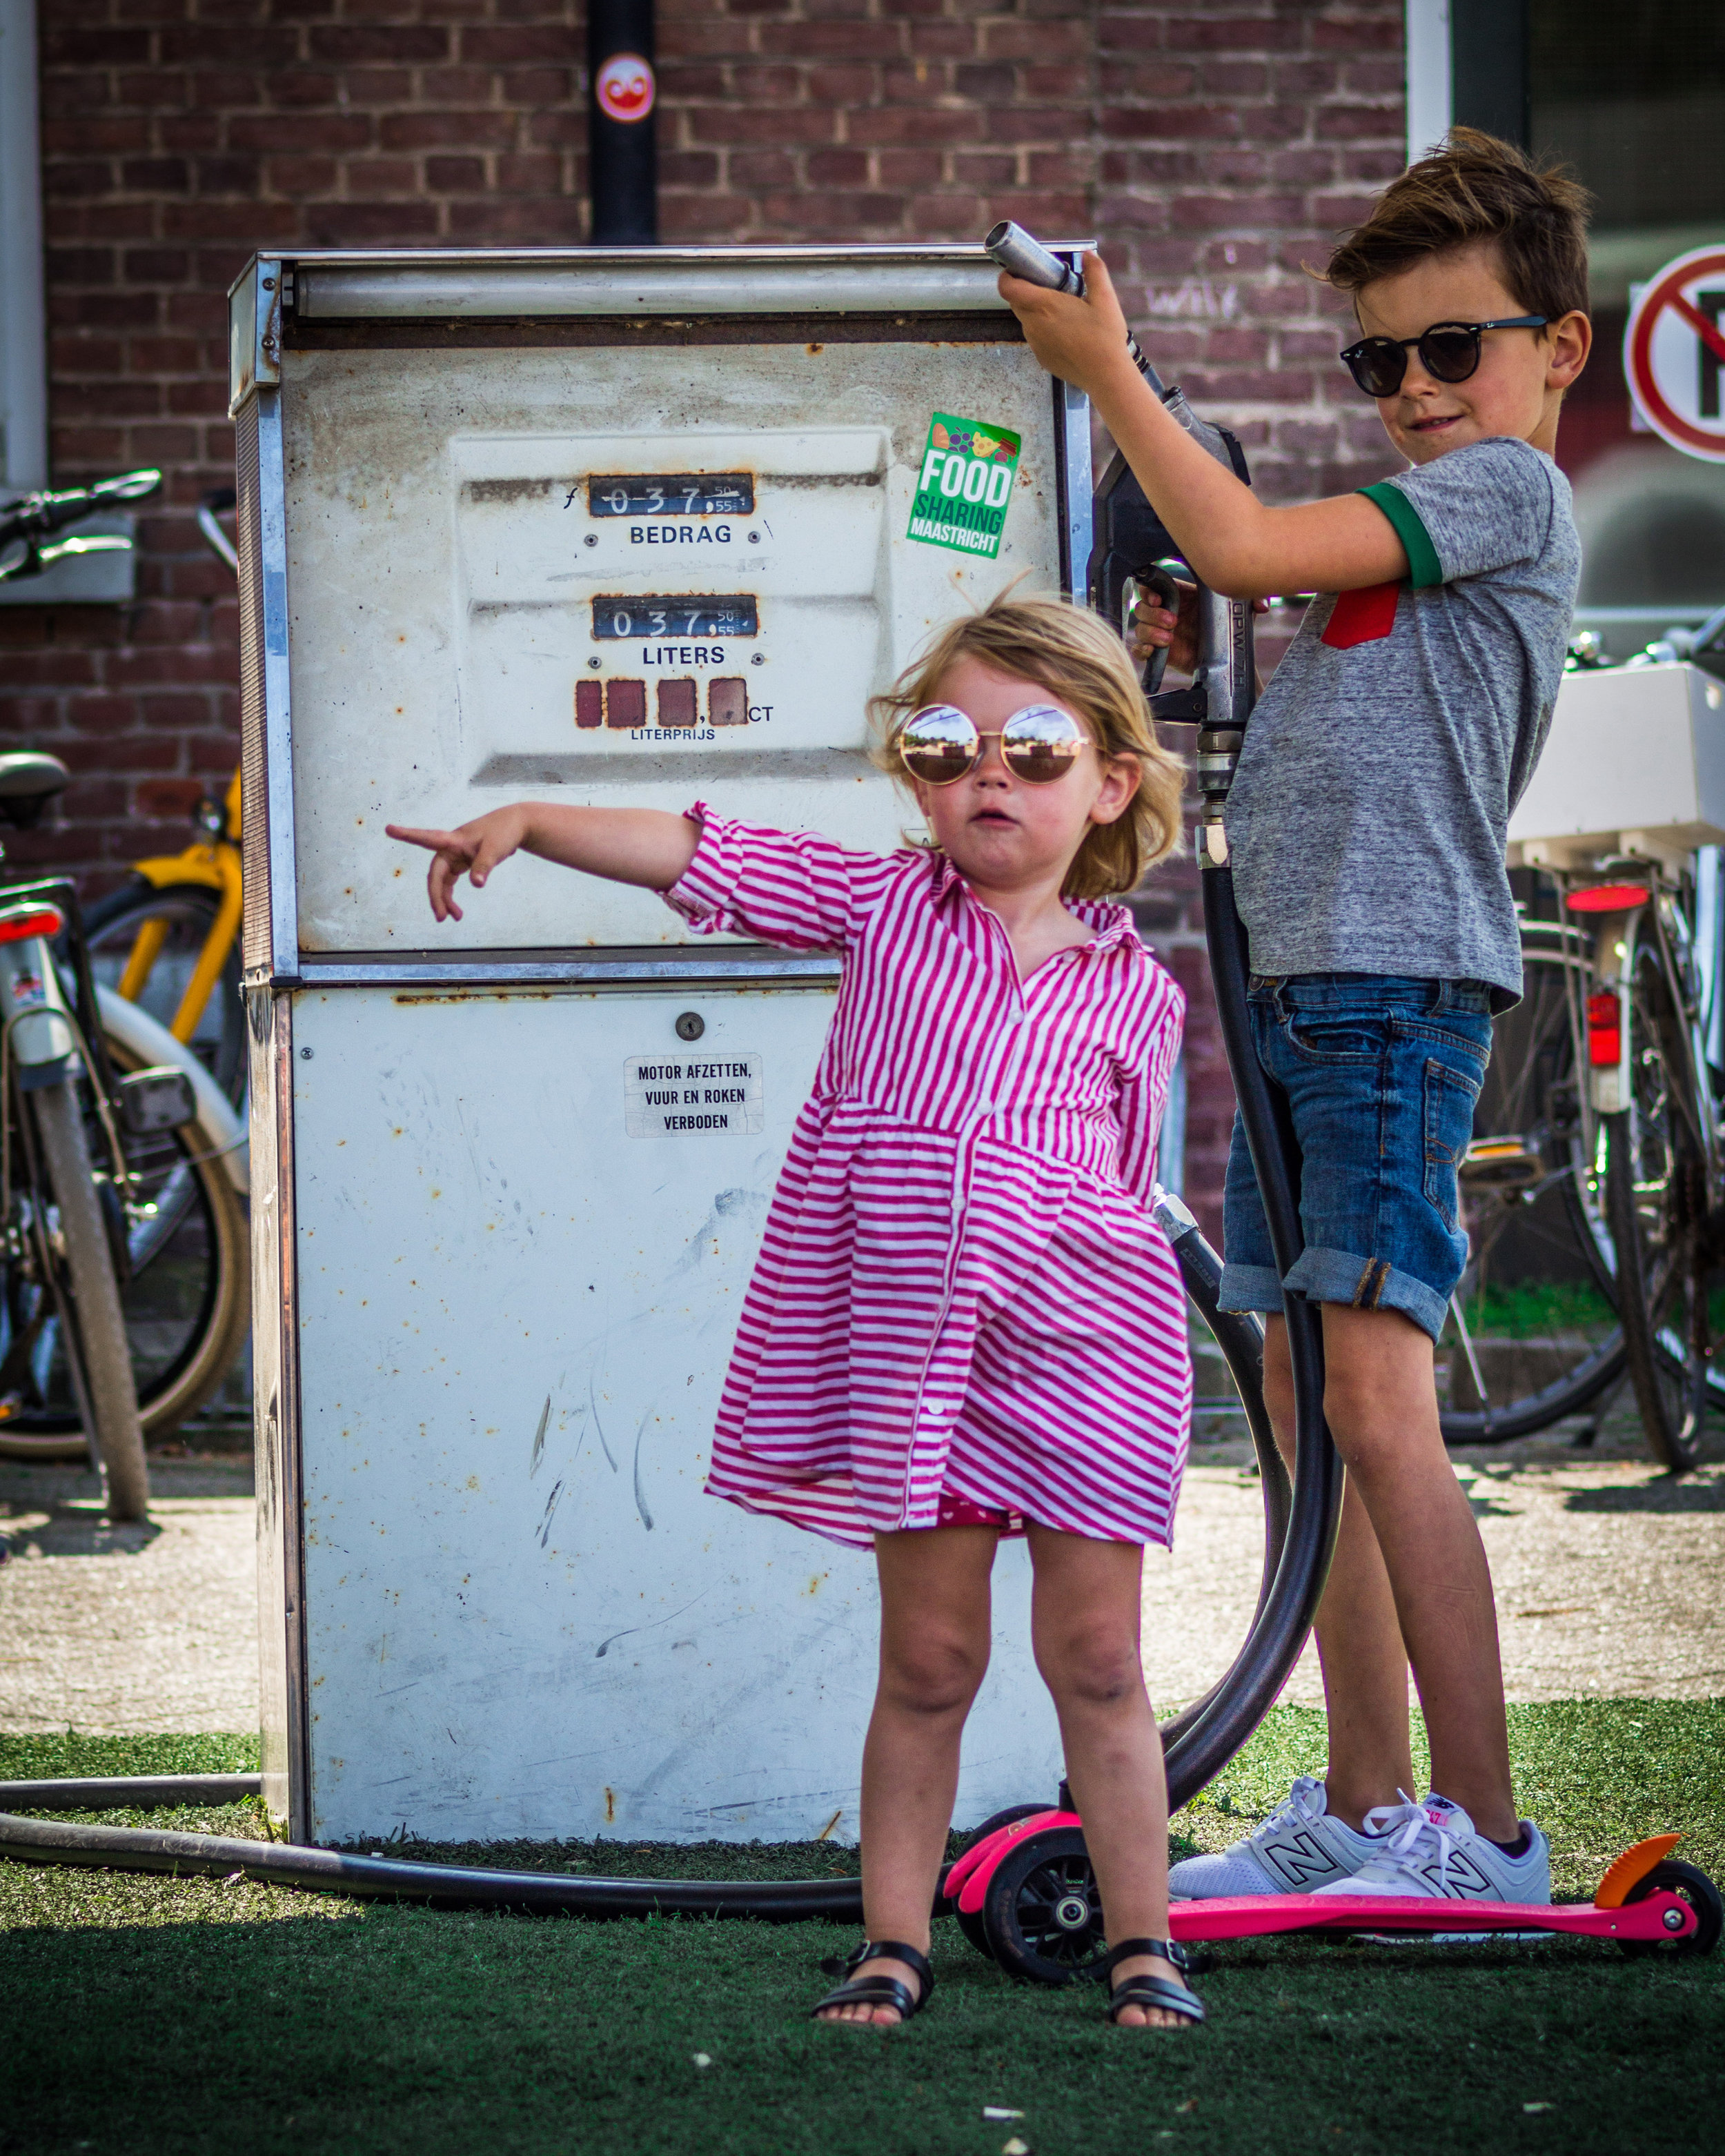 Tapijn - Maastricht - speeltuin pomp